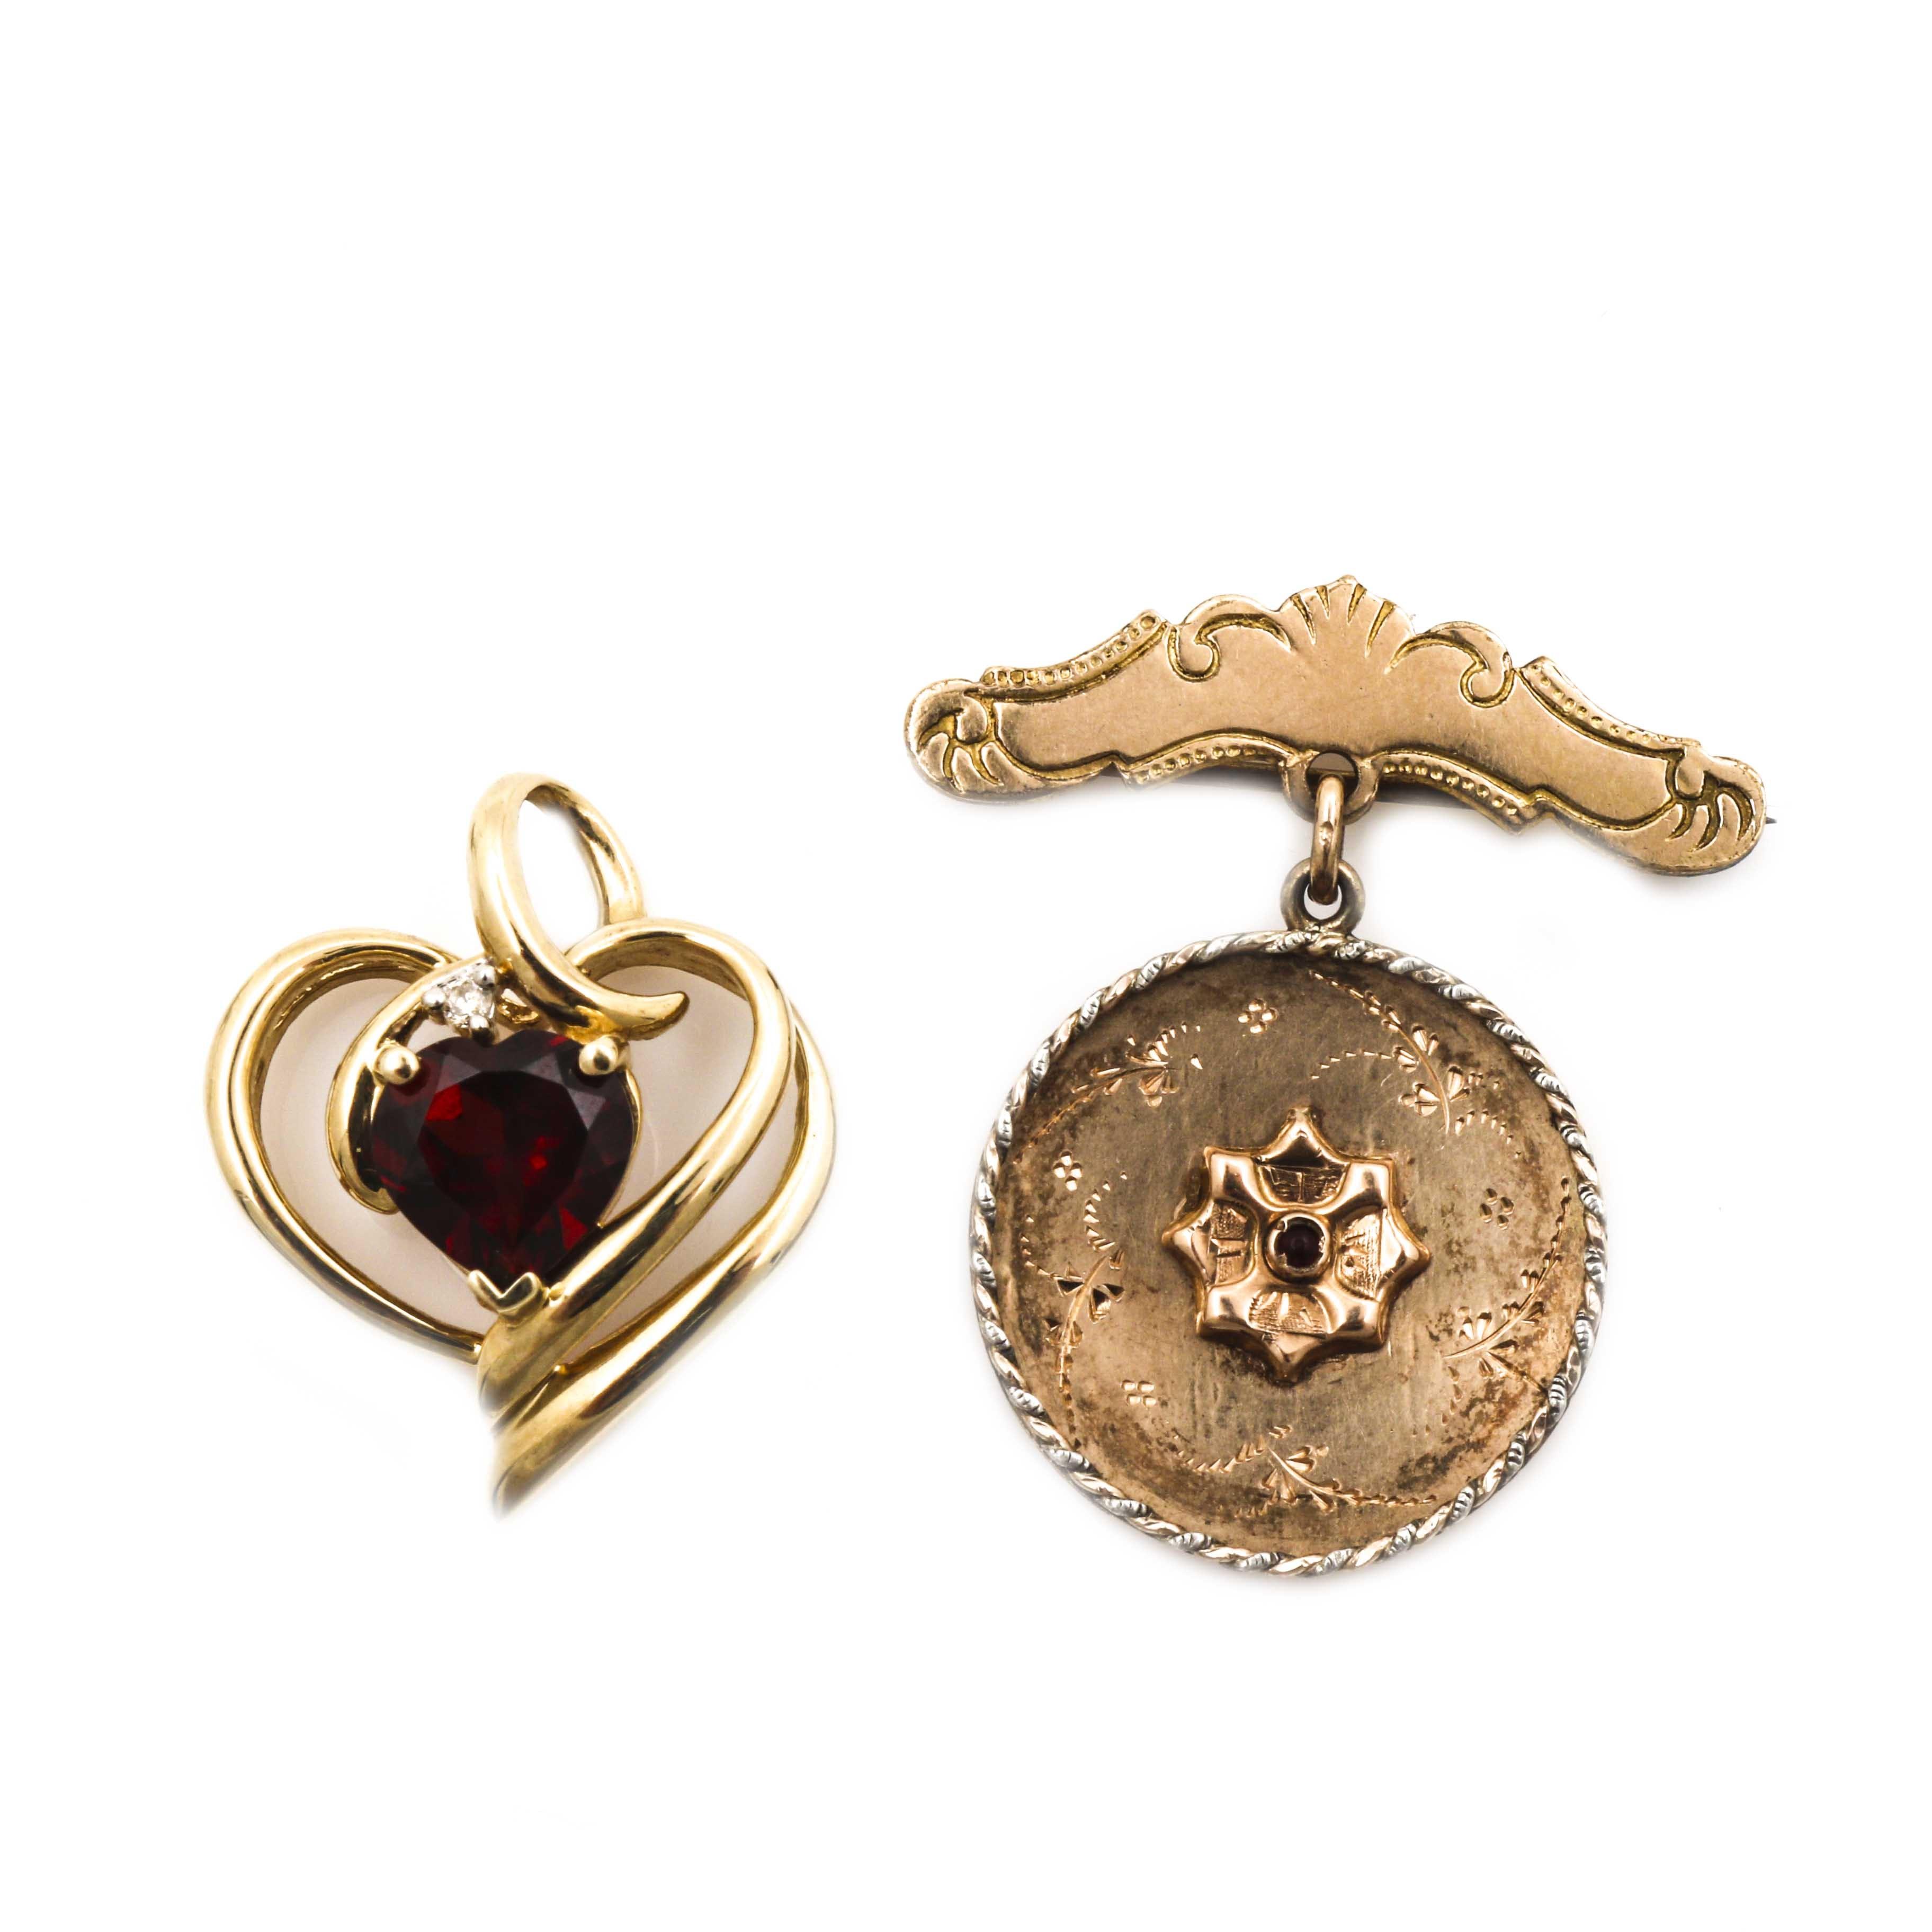 Victorian 14K Yellow Gold Brooch and 10K Yellow Gold Garnet Pendant